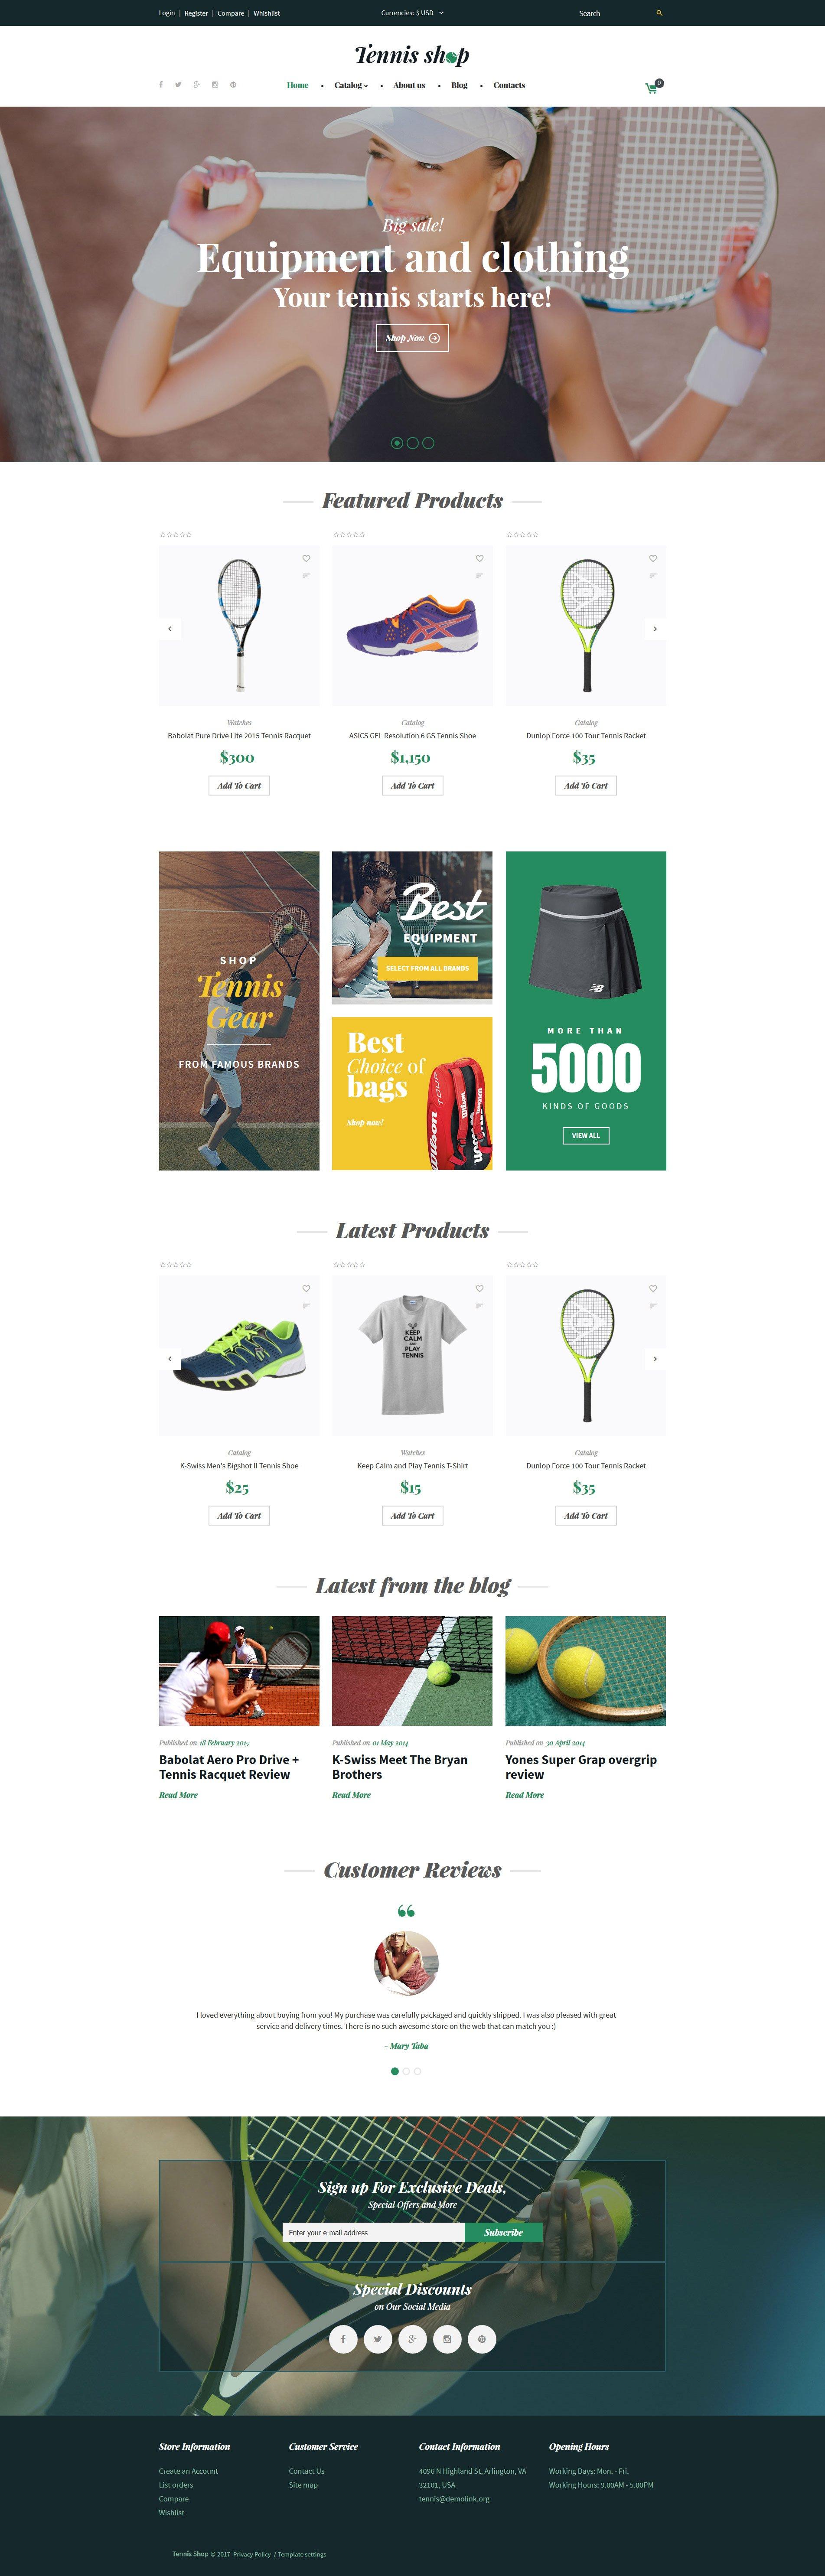 Tennis Shop VirtueMart-mall #62141